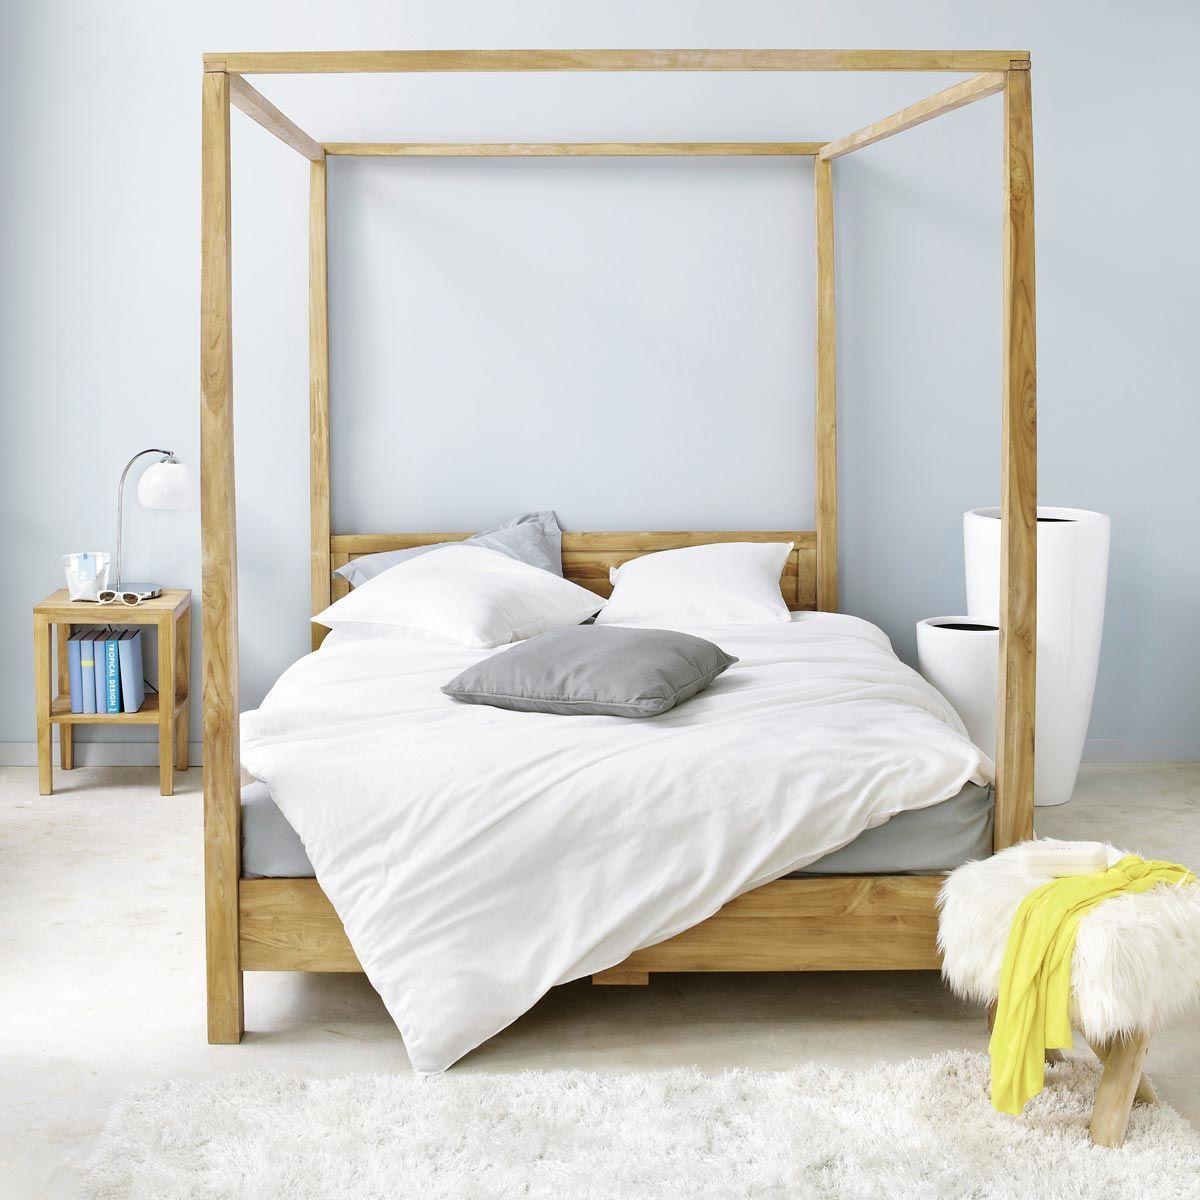 Letto a baldacchino 160 x 200 in acacia Bed design